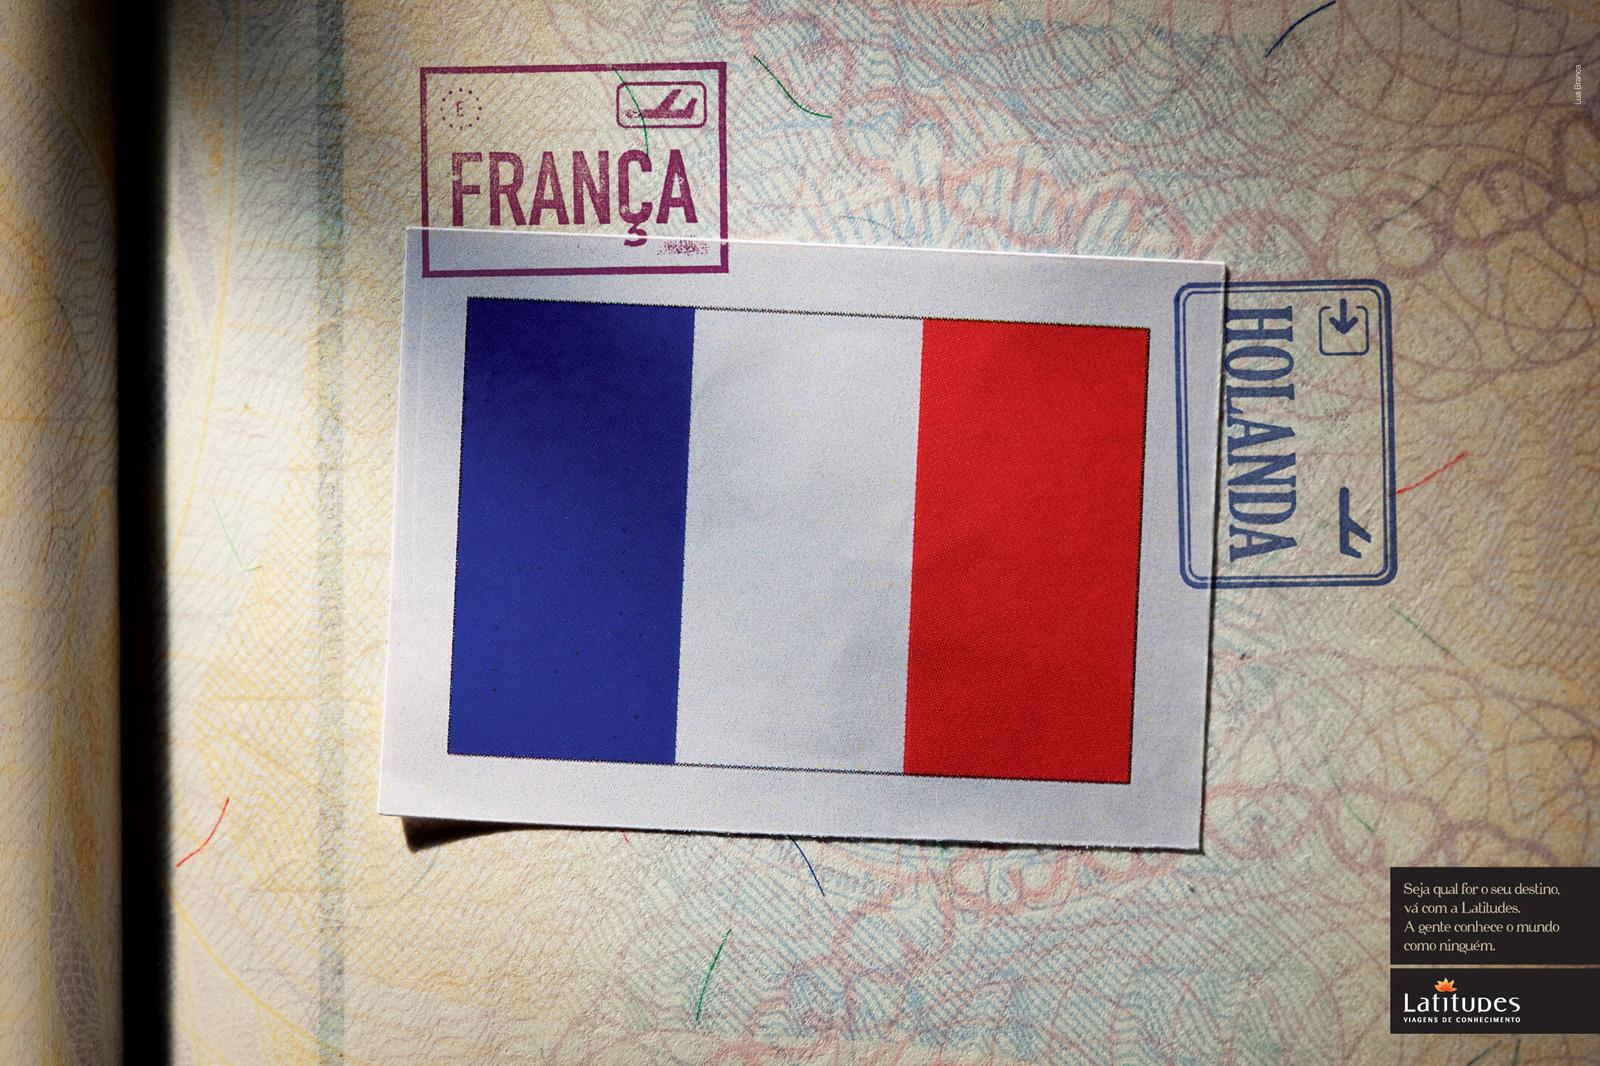 Latitudes Print Ad -  France / Holland